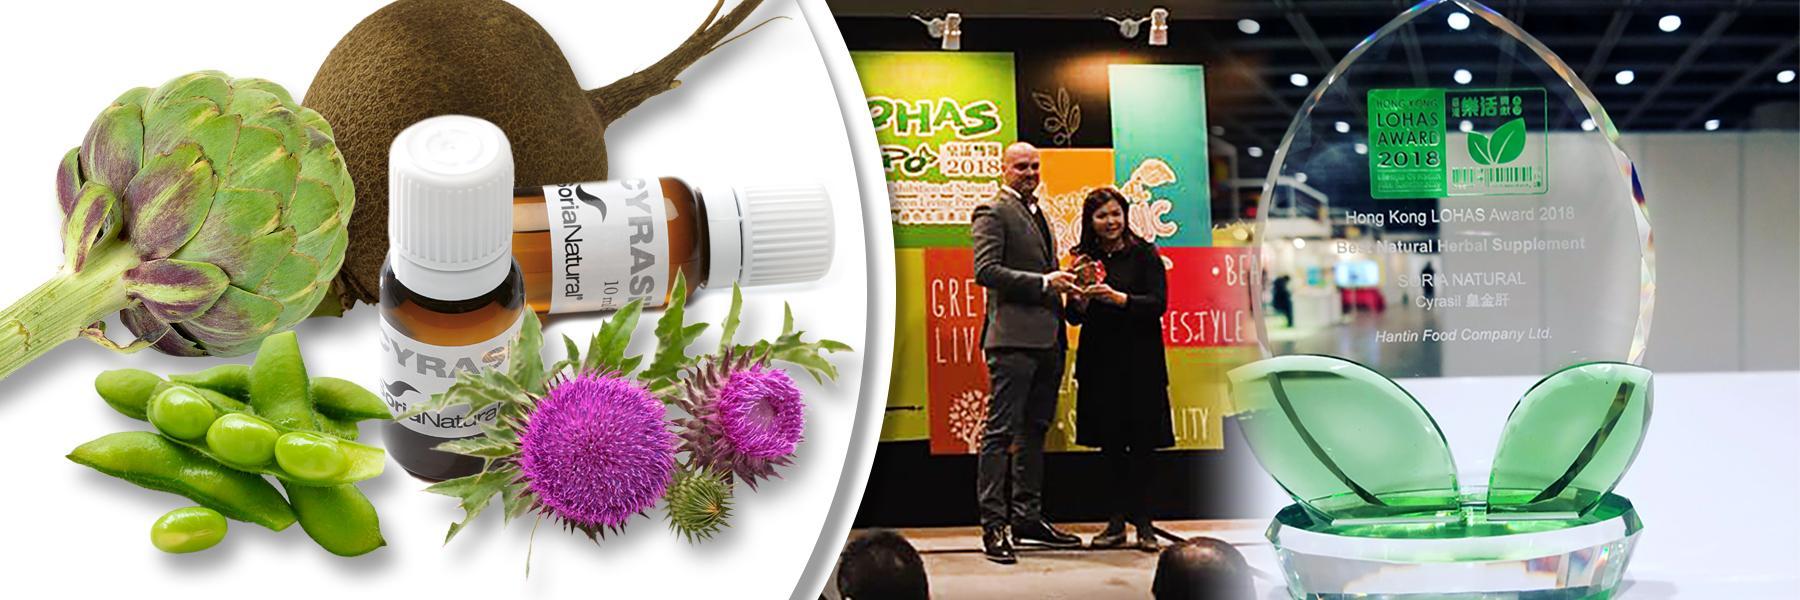 Cyrasil awarded Best Natural Herbal Supplement